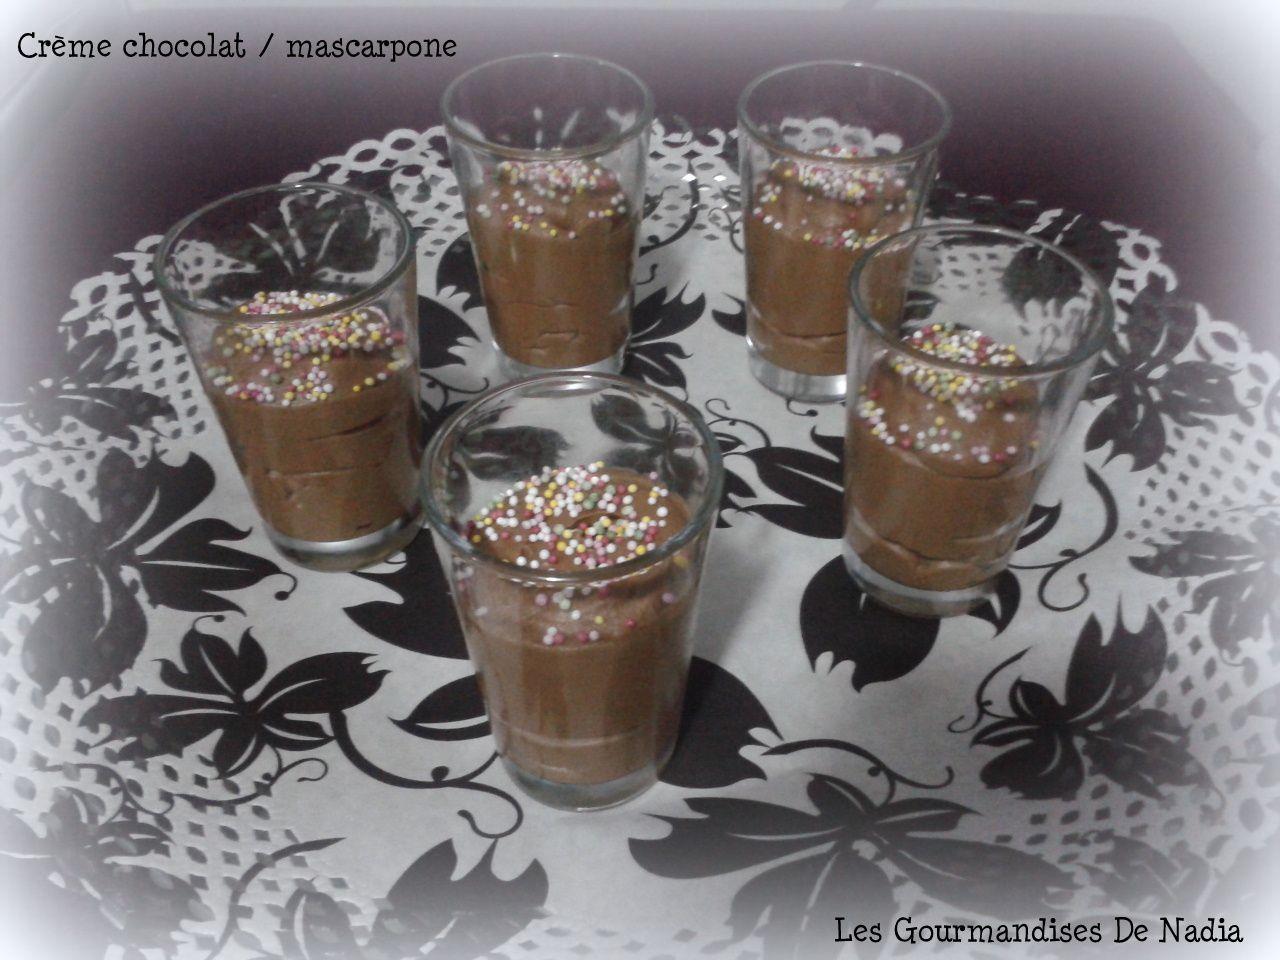 CRÈME CHOCOLAT / MASCARPONE